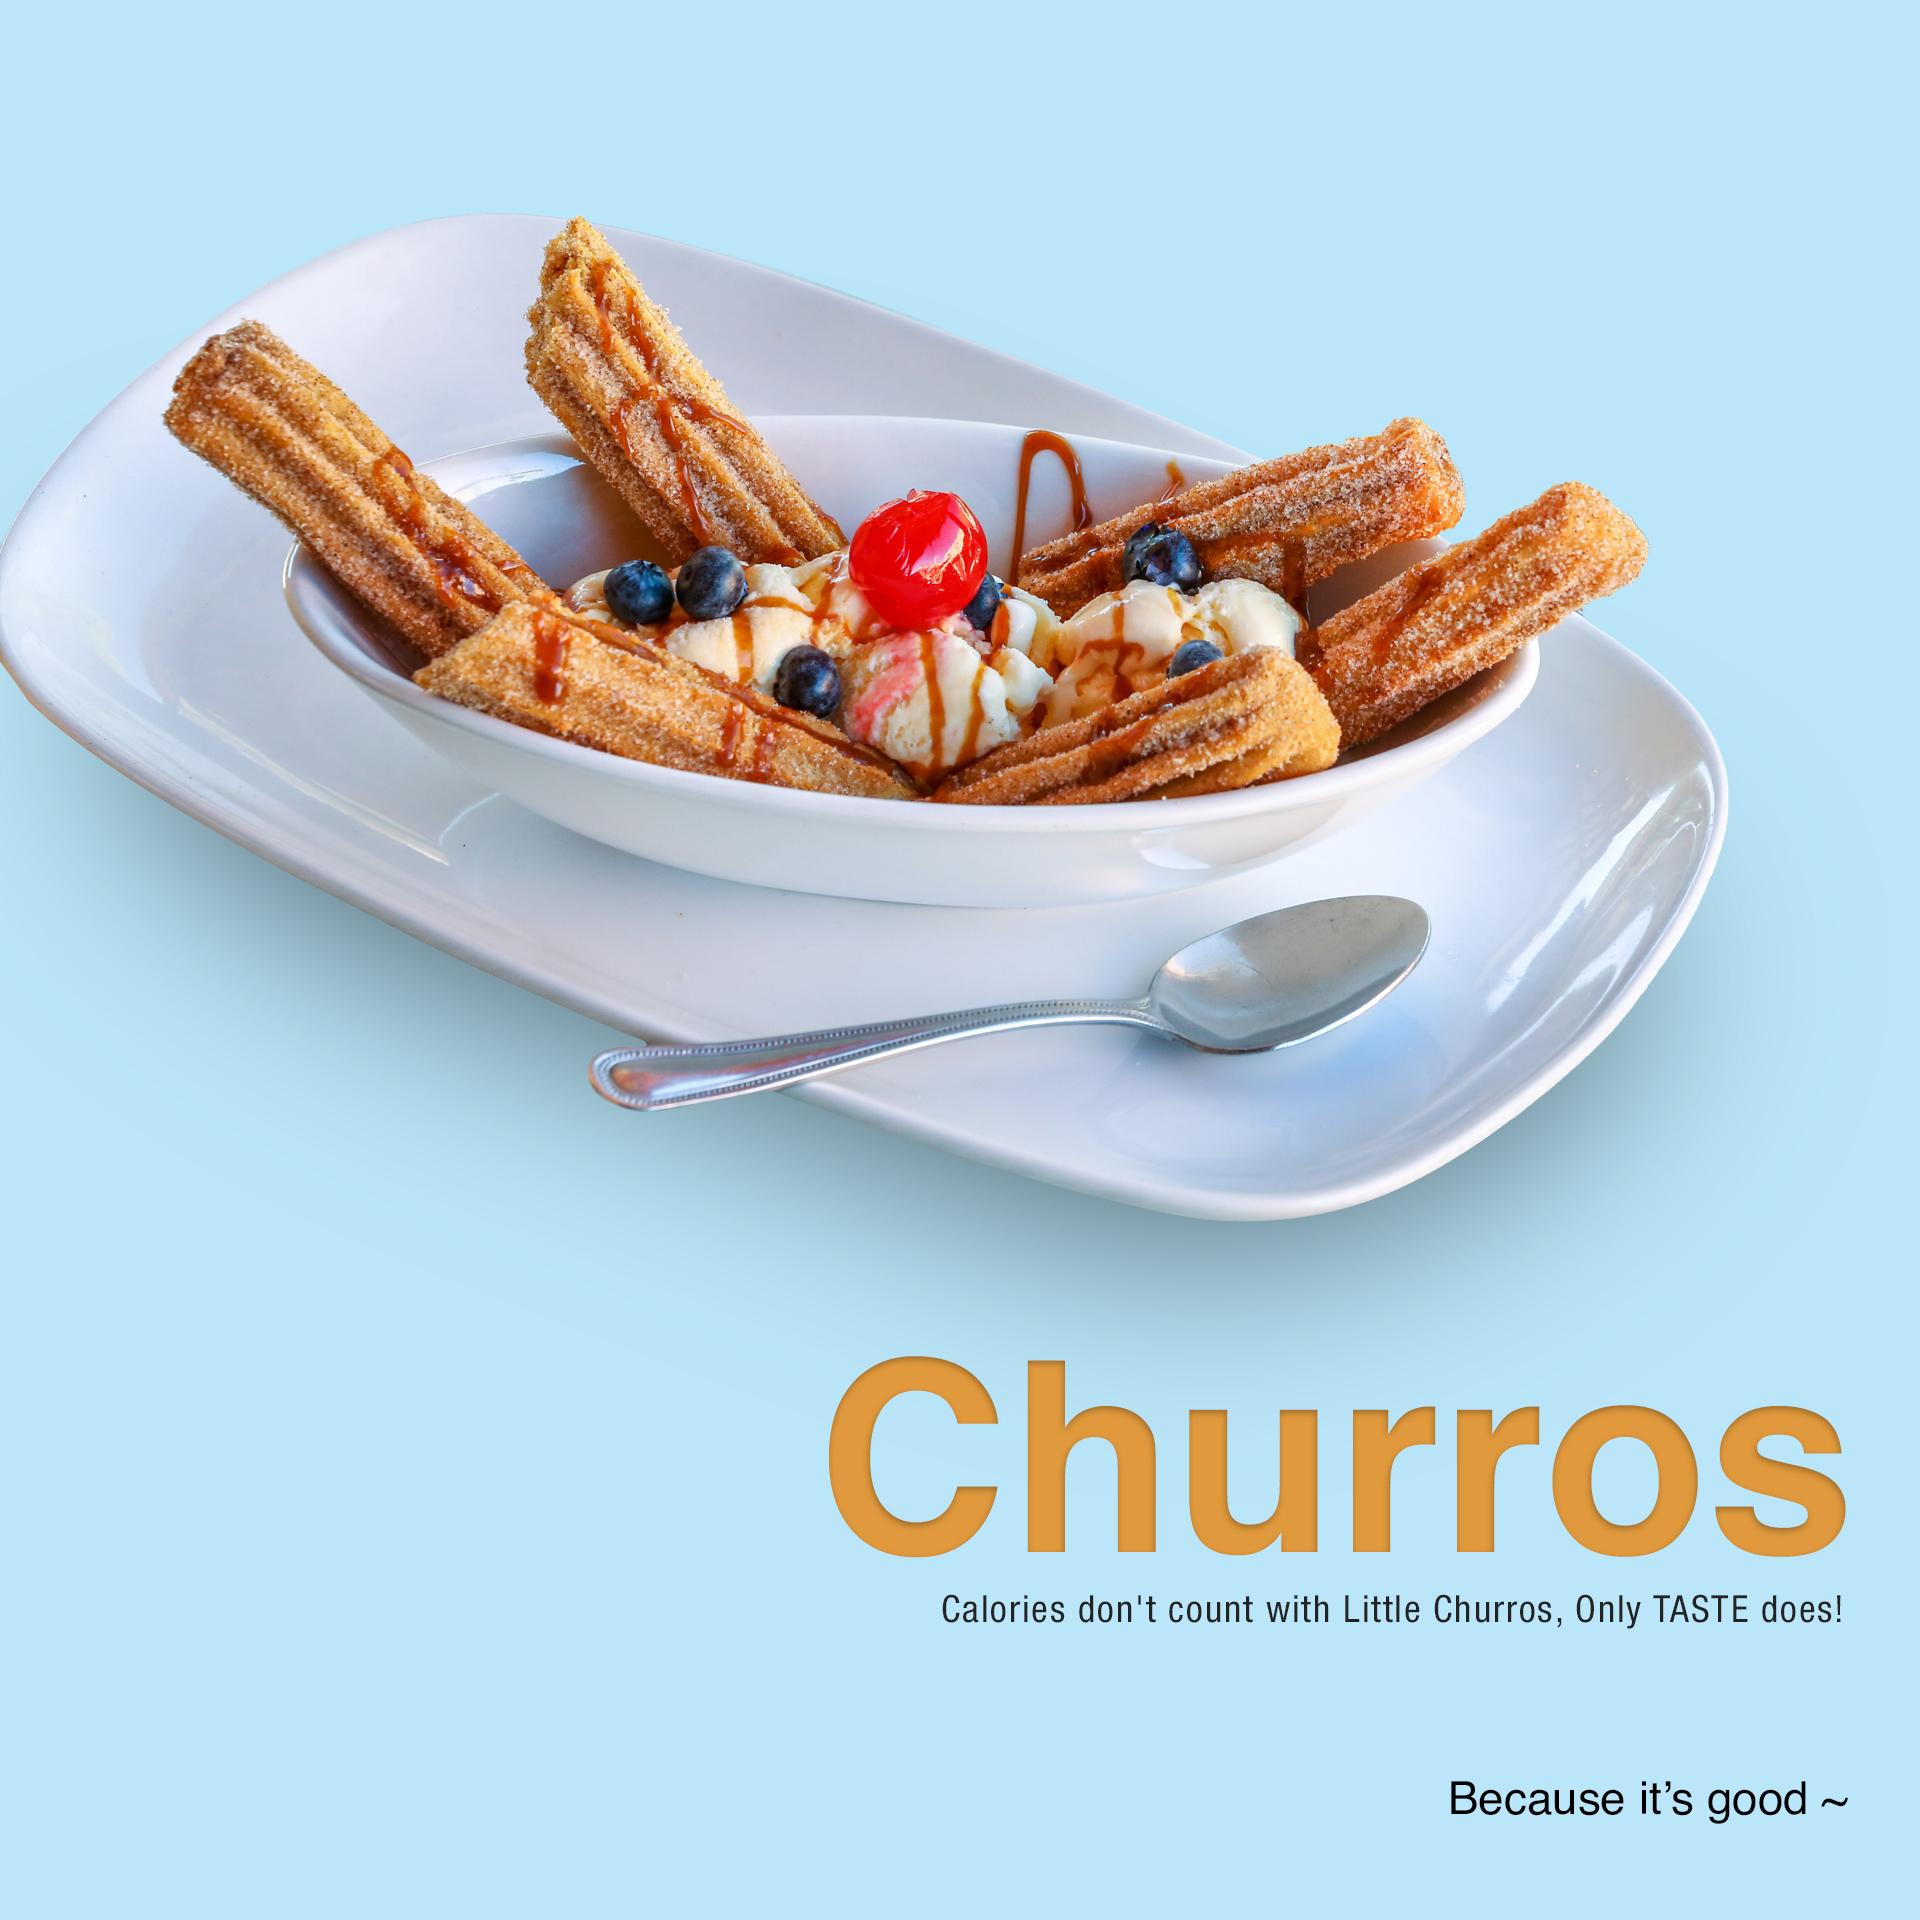 Little Churros image